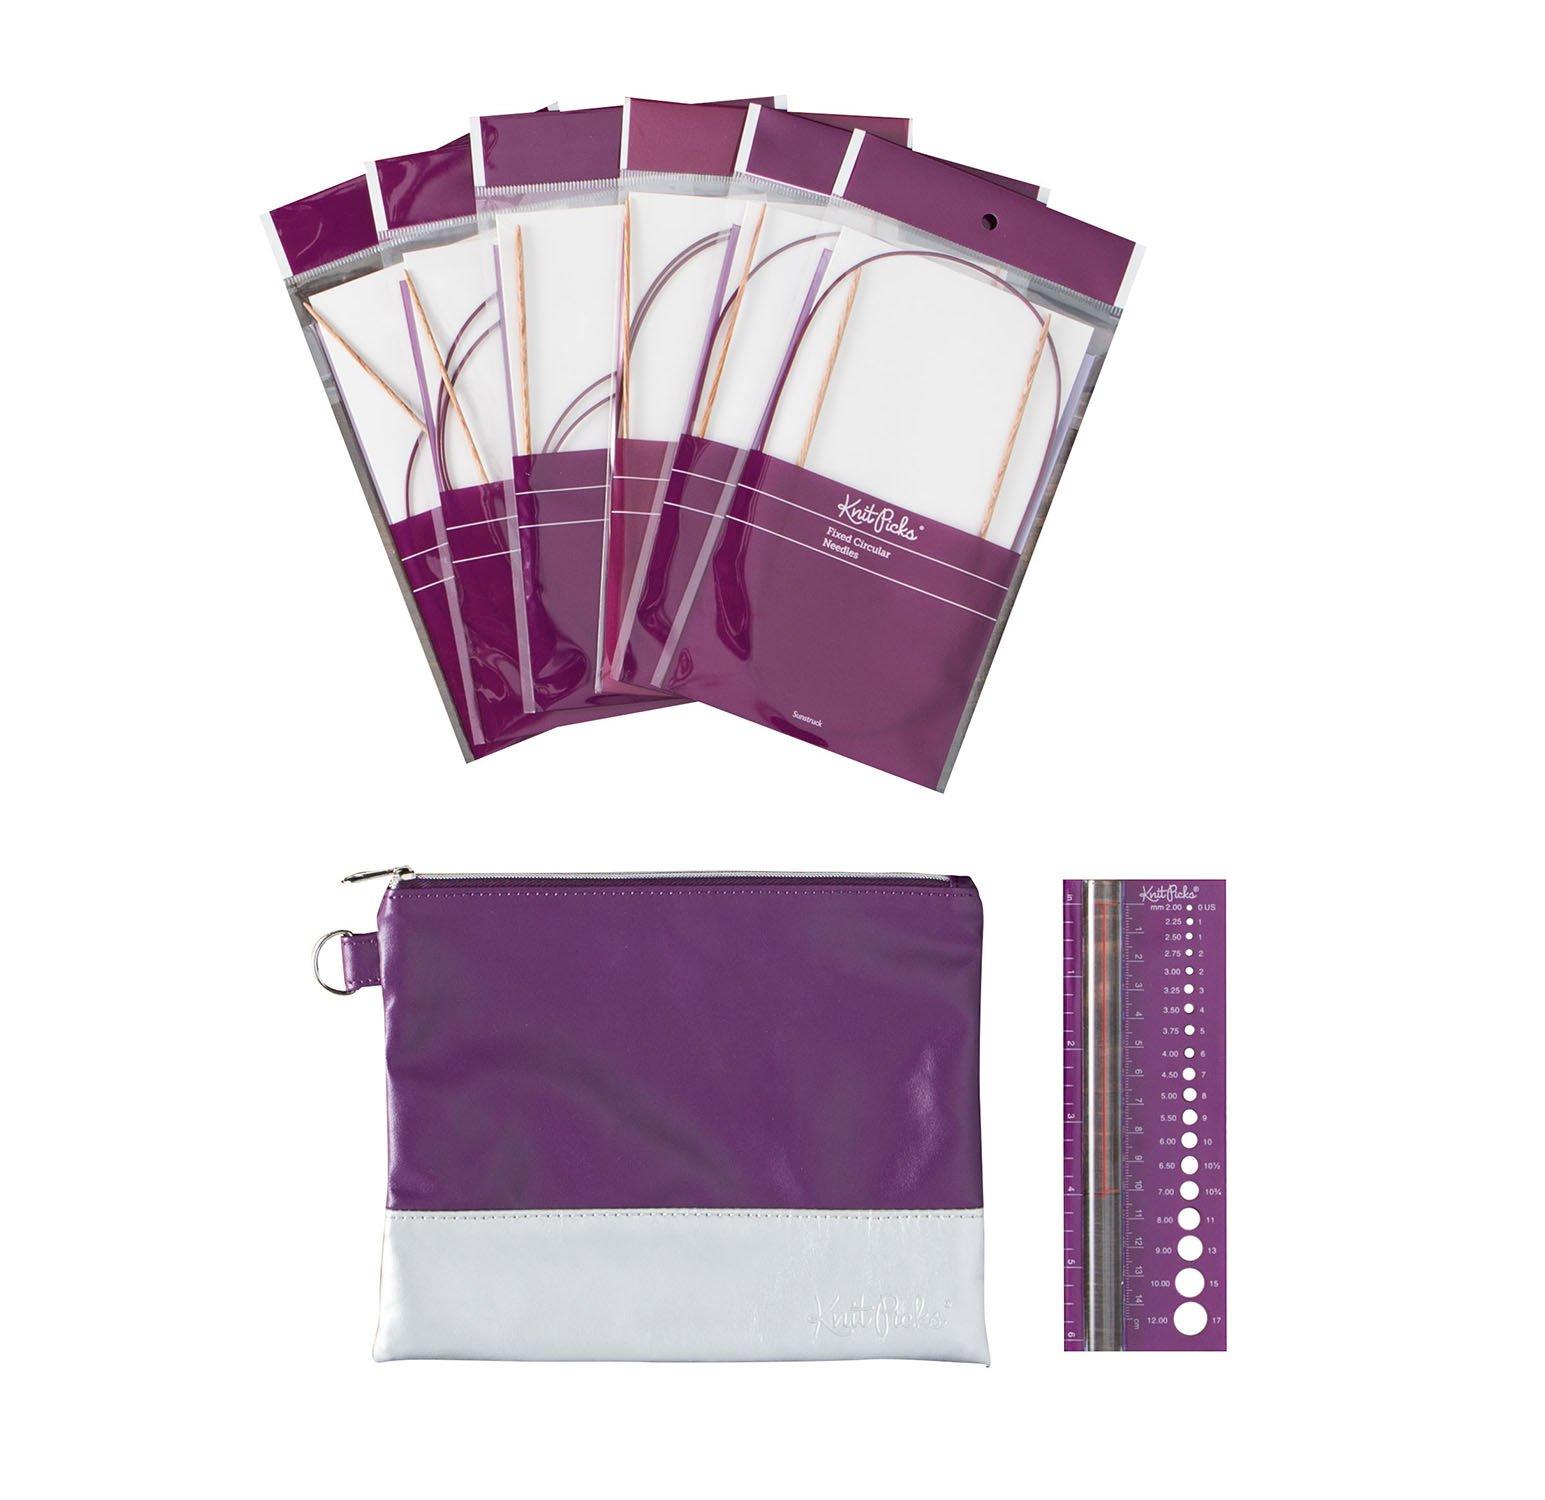 Knit Picks Fixed Circular Sock Knitting Needle Set (Sunstruck)